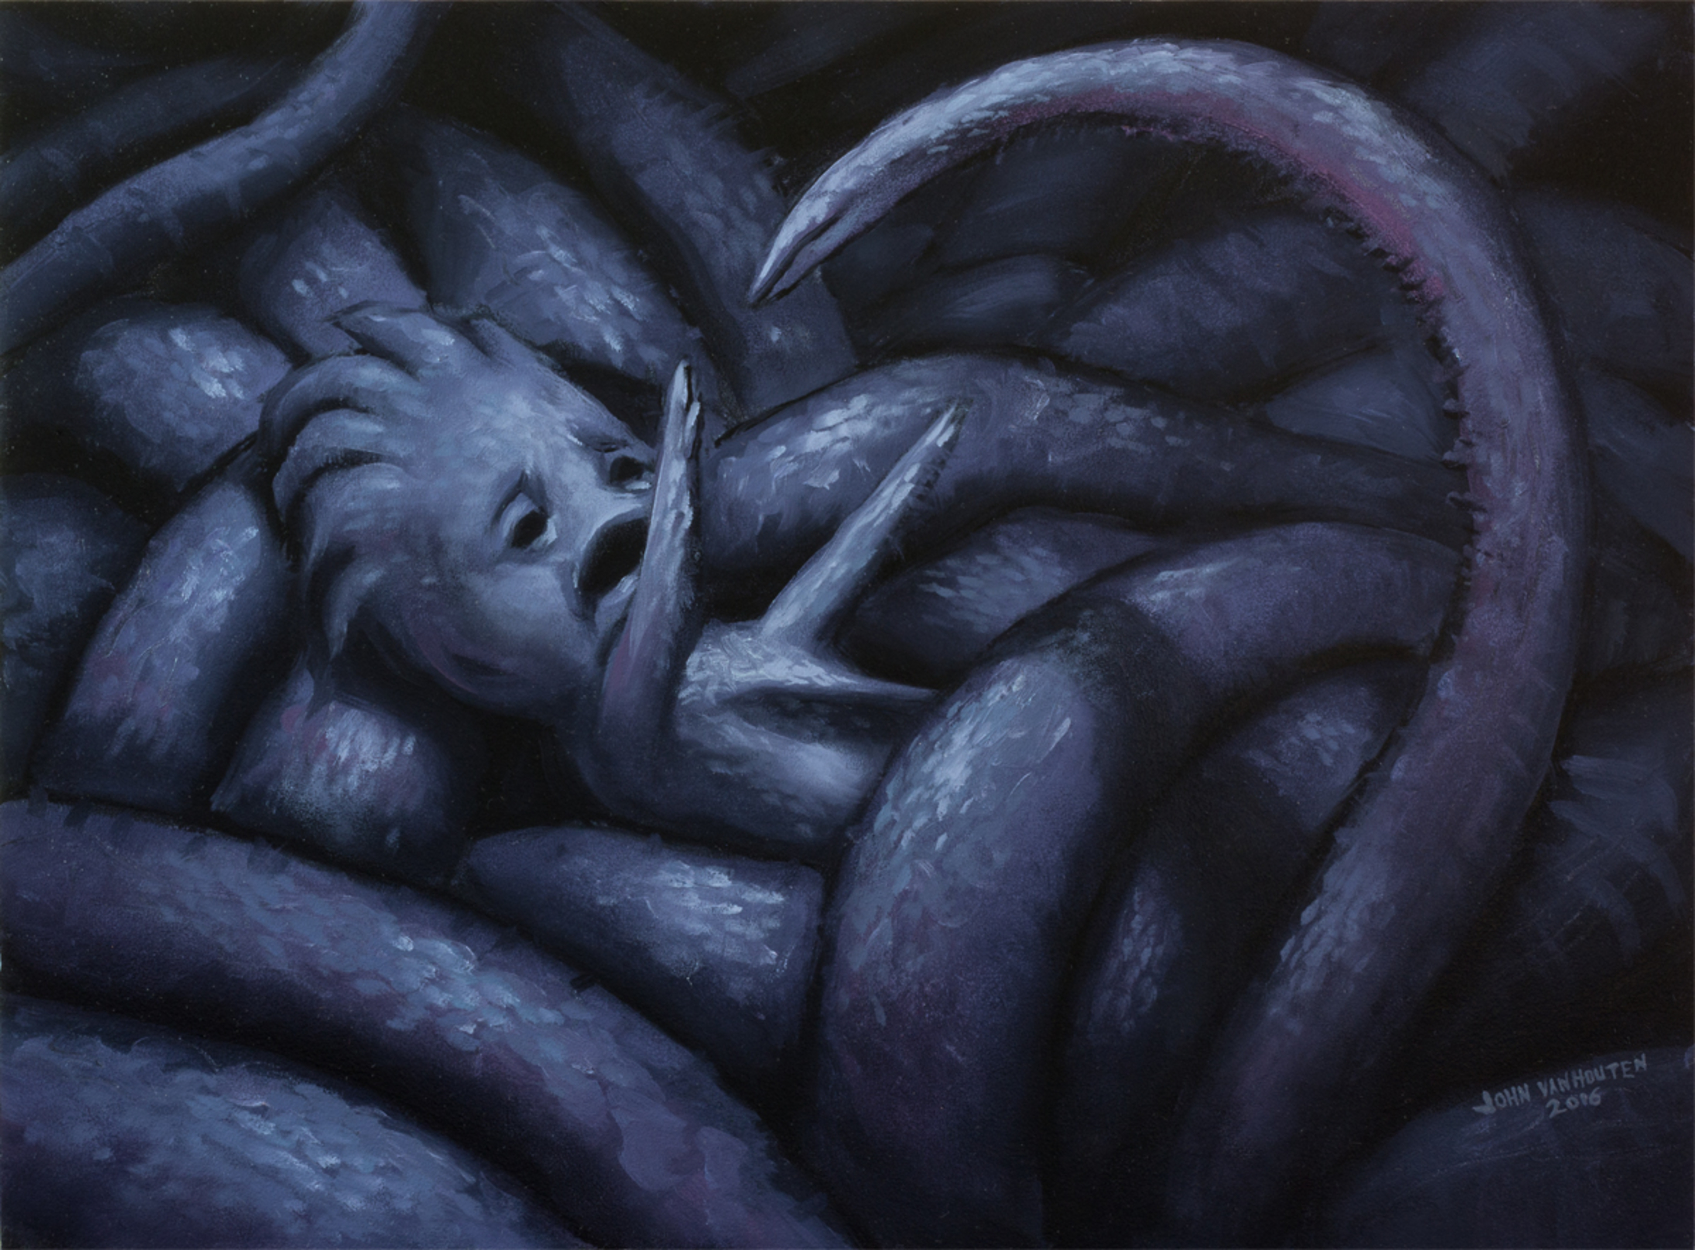 Aphotic Nativity Artwork by John VanHouten